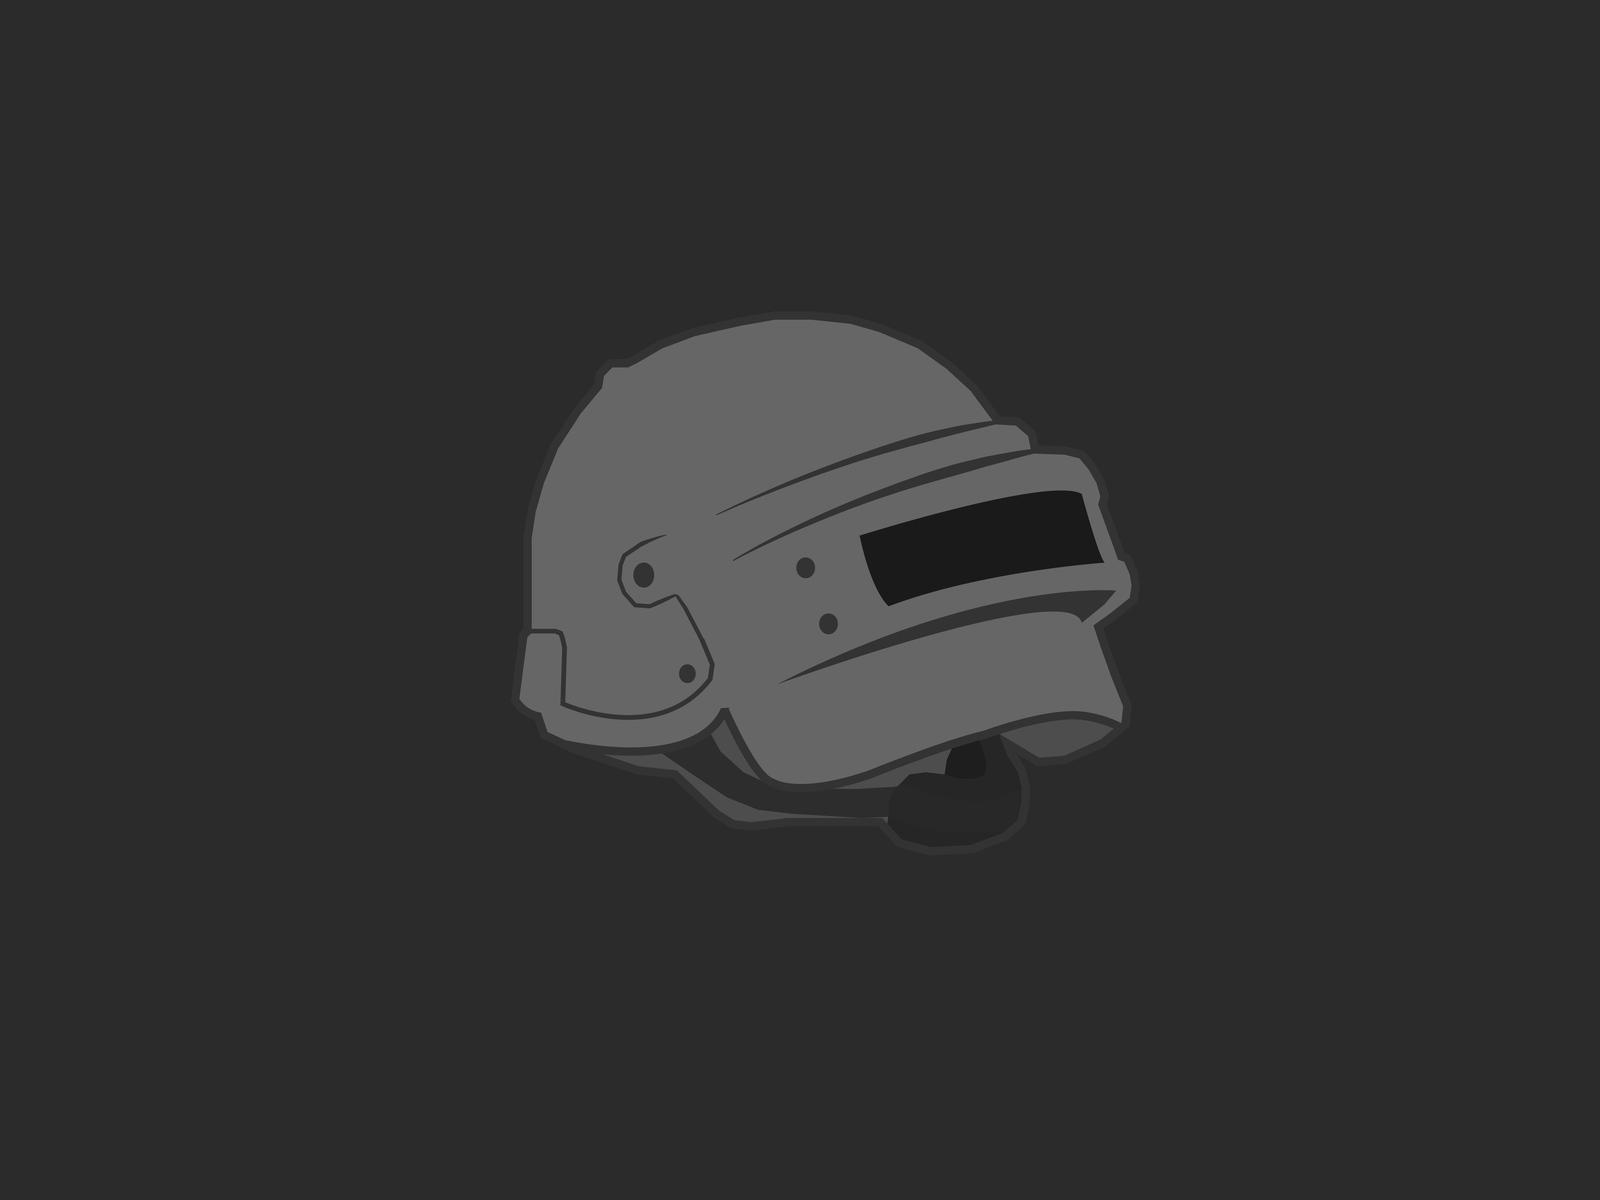 Pubg Hd Stickers: Pubg Helmet Vector